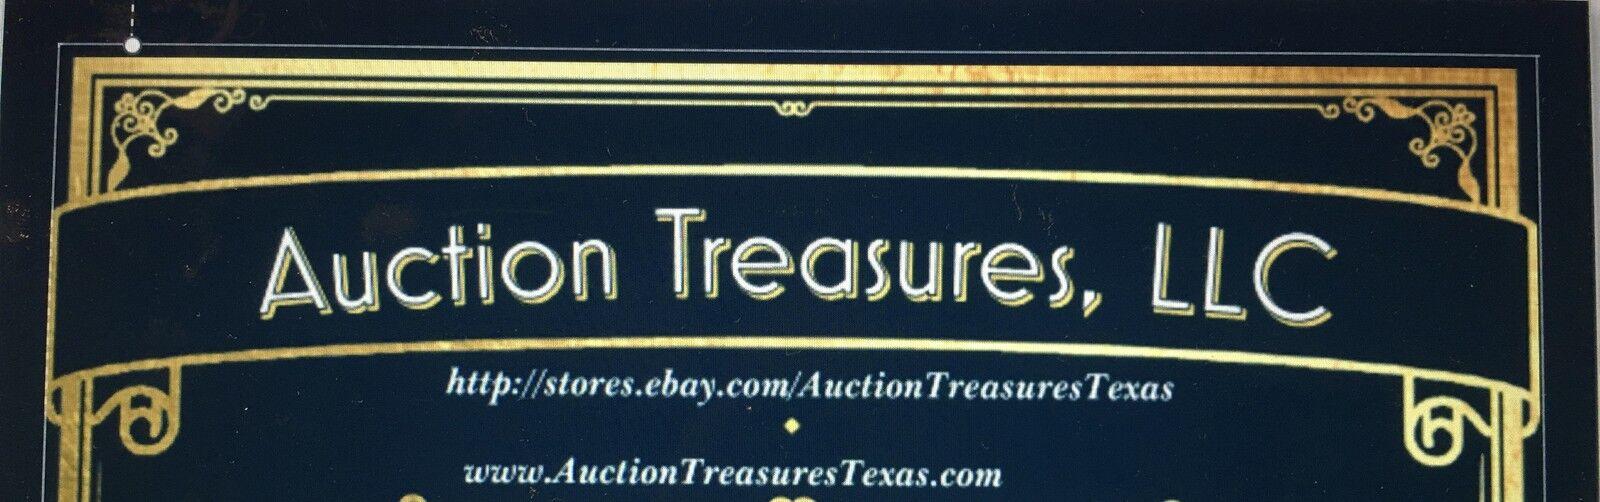 AuctionTreasuresTexas